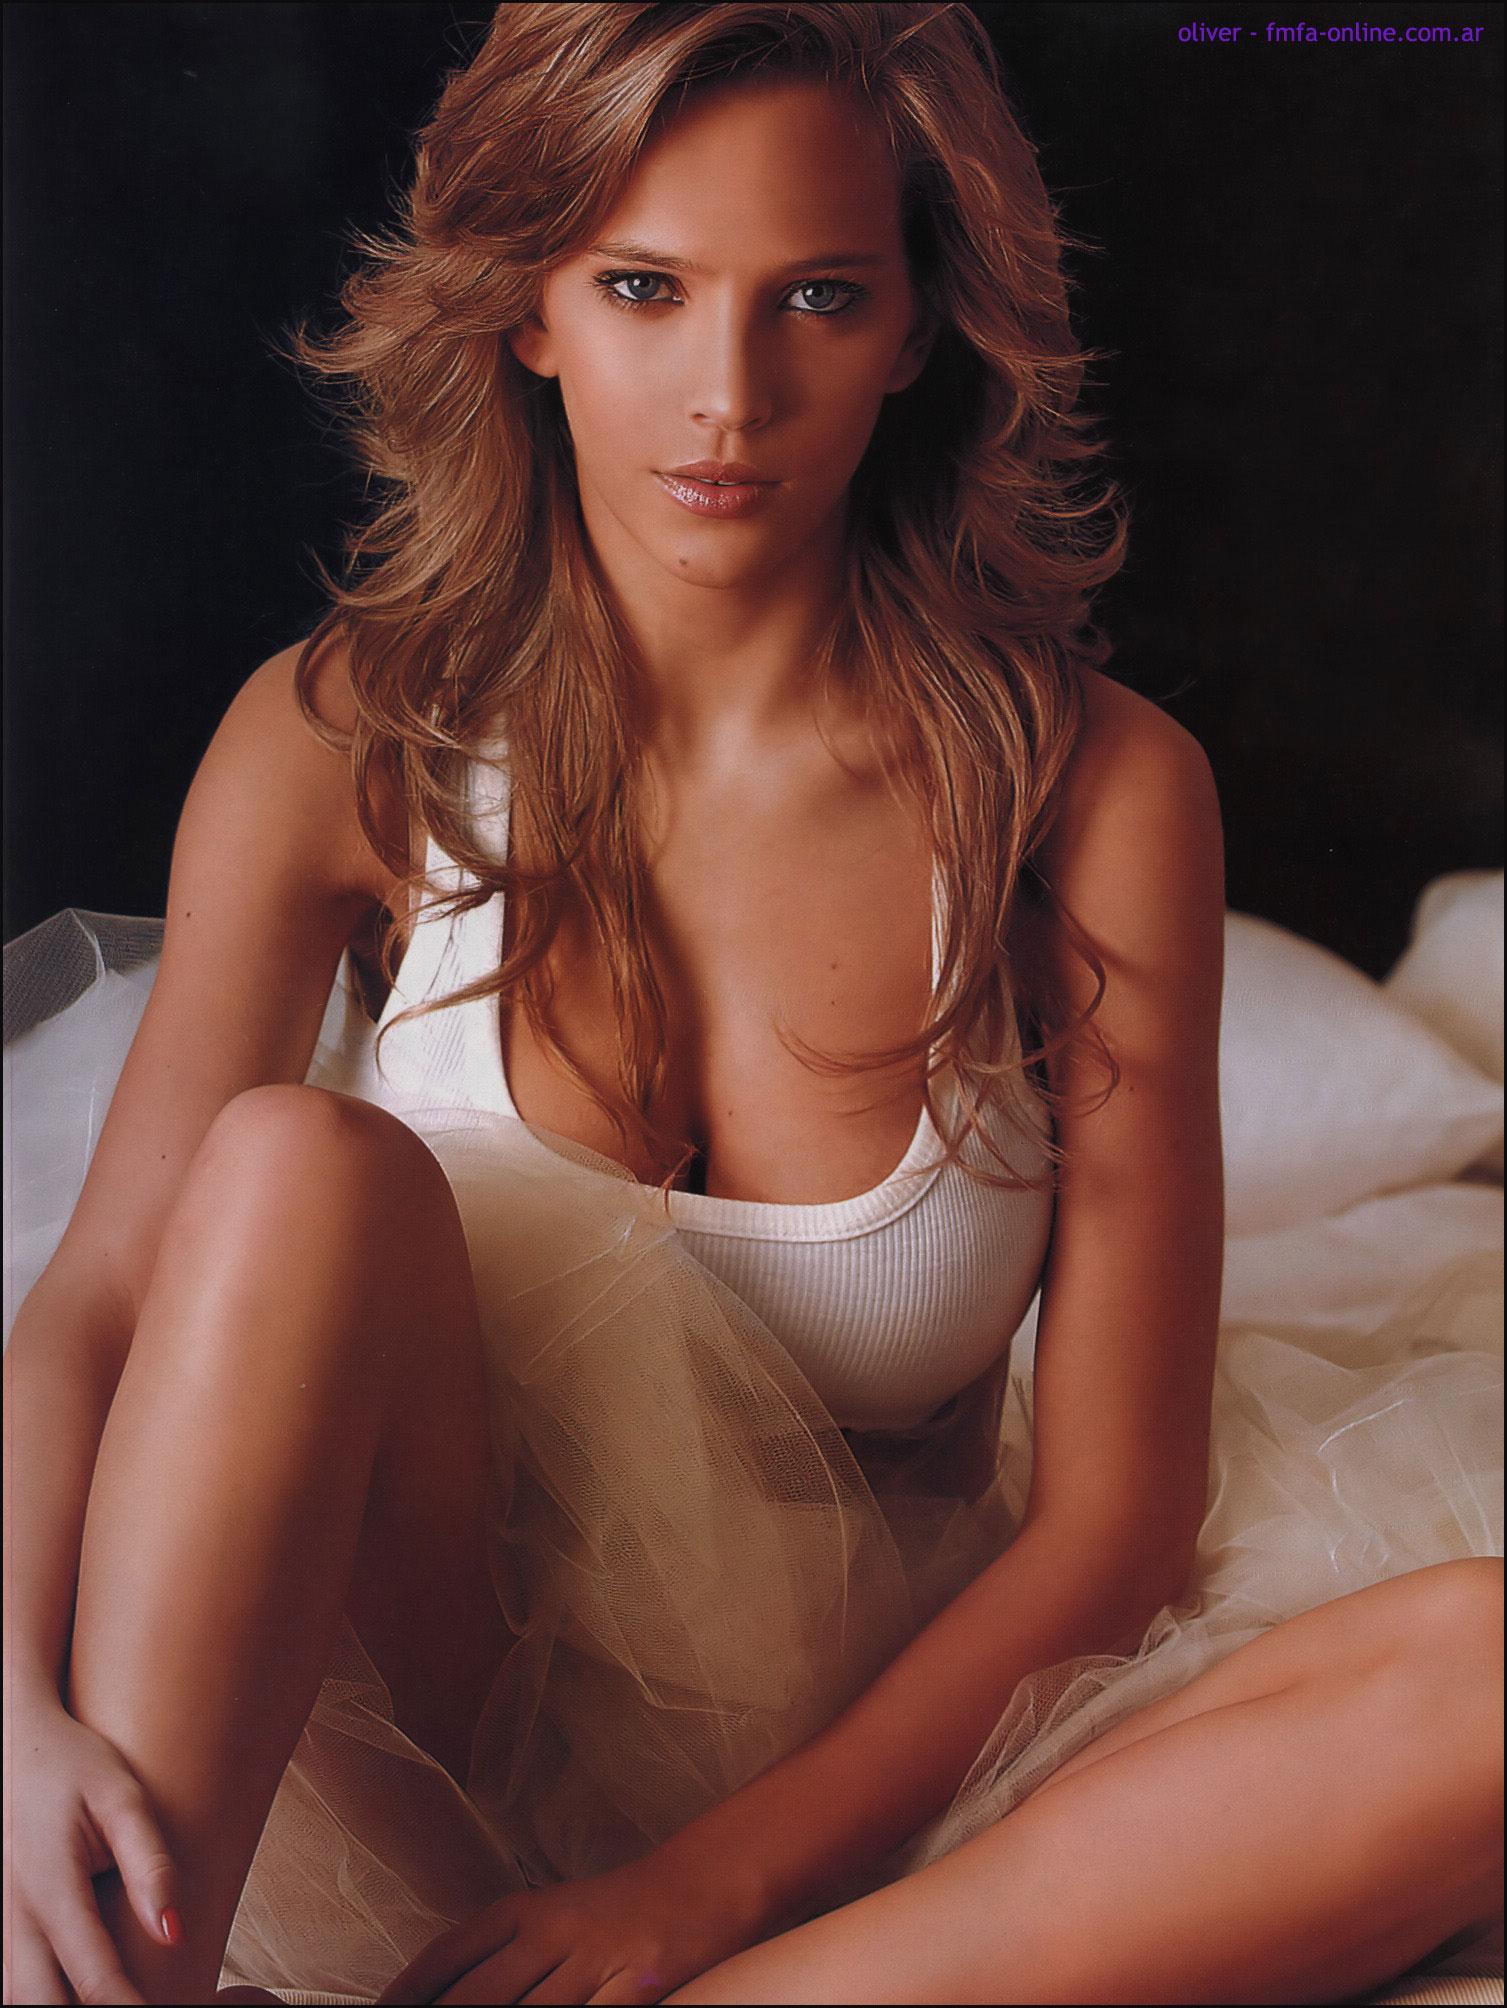 eroticheskie-foto-luiziani-lopilato